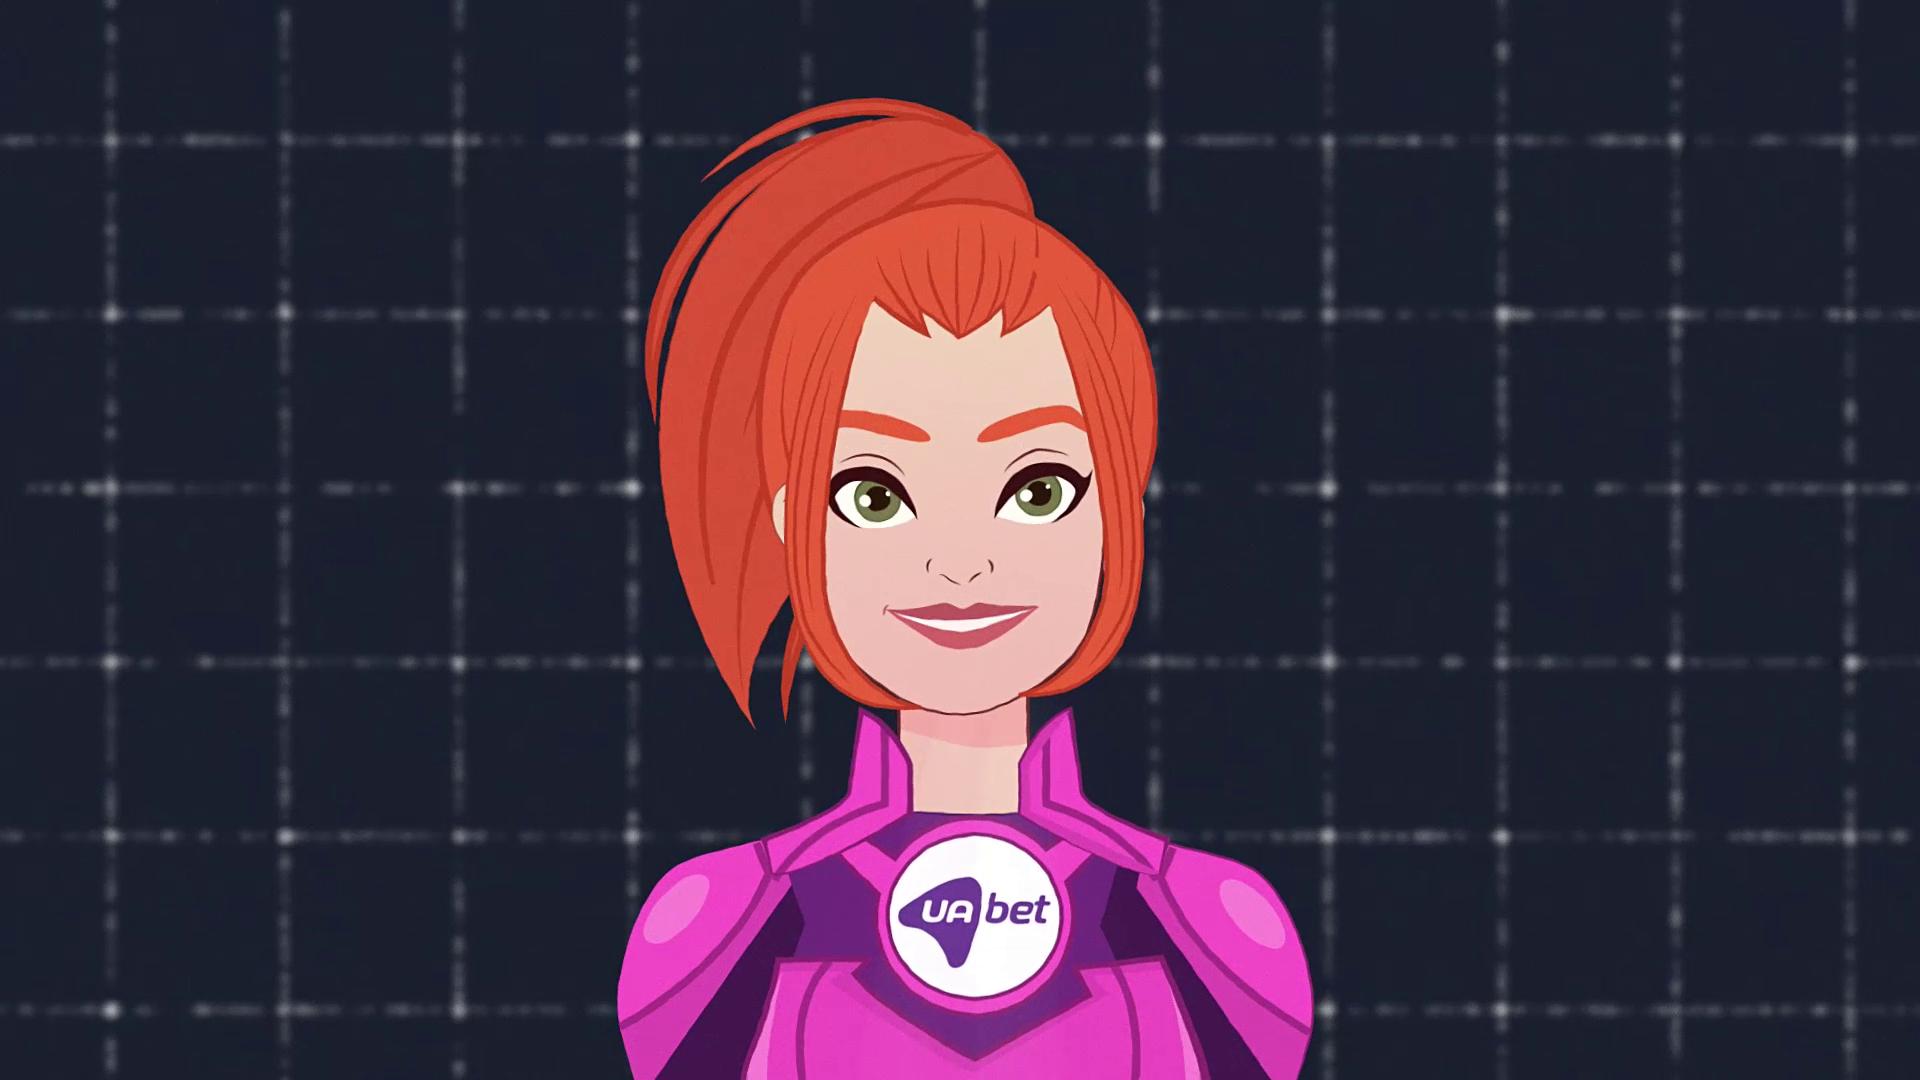 Smiling girl wins robot